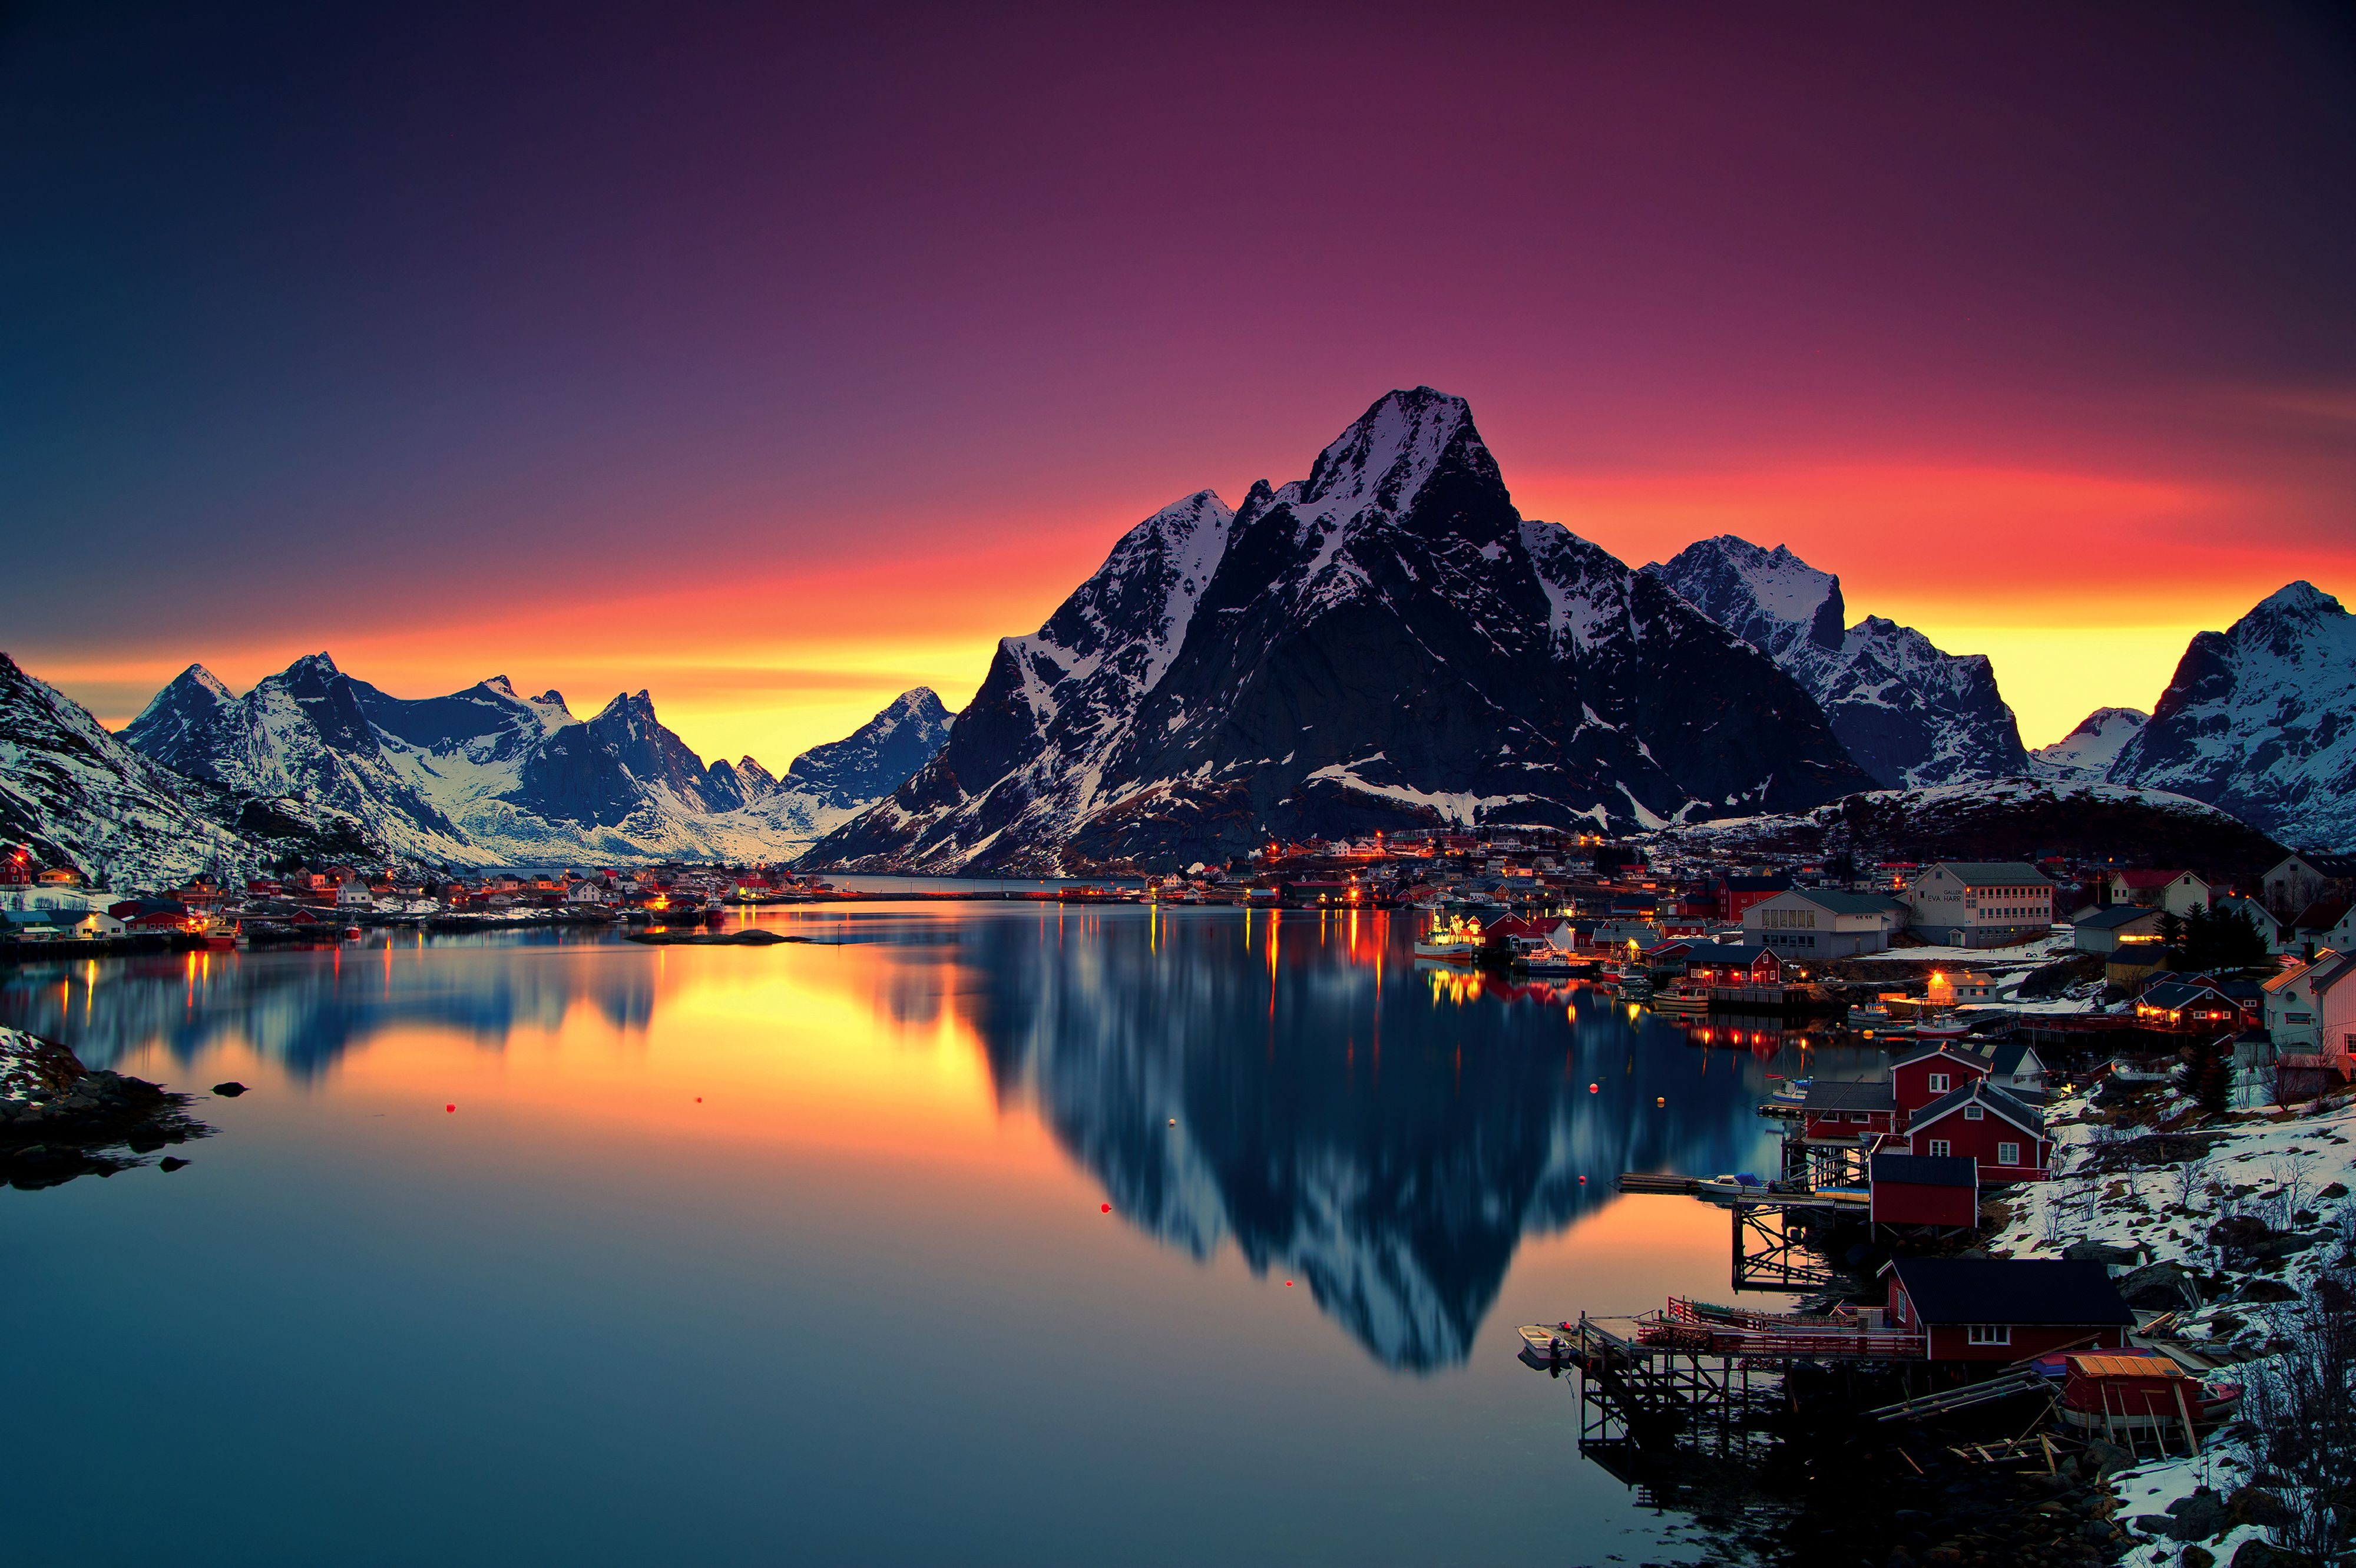 4k Mountain Wallpapers Top Free 4k Mountain Backgrounds